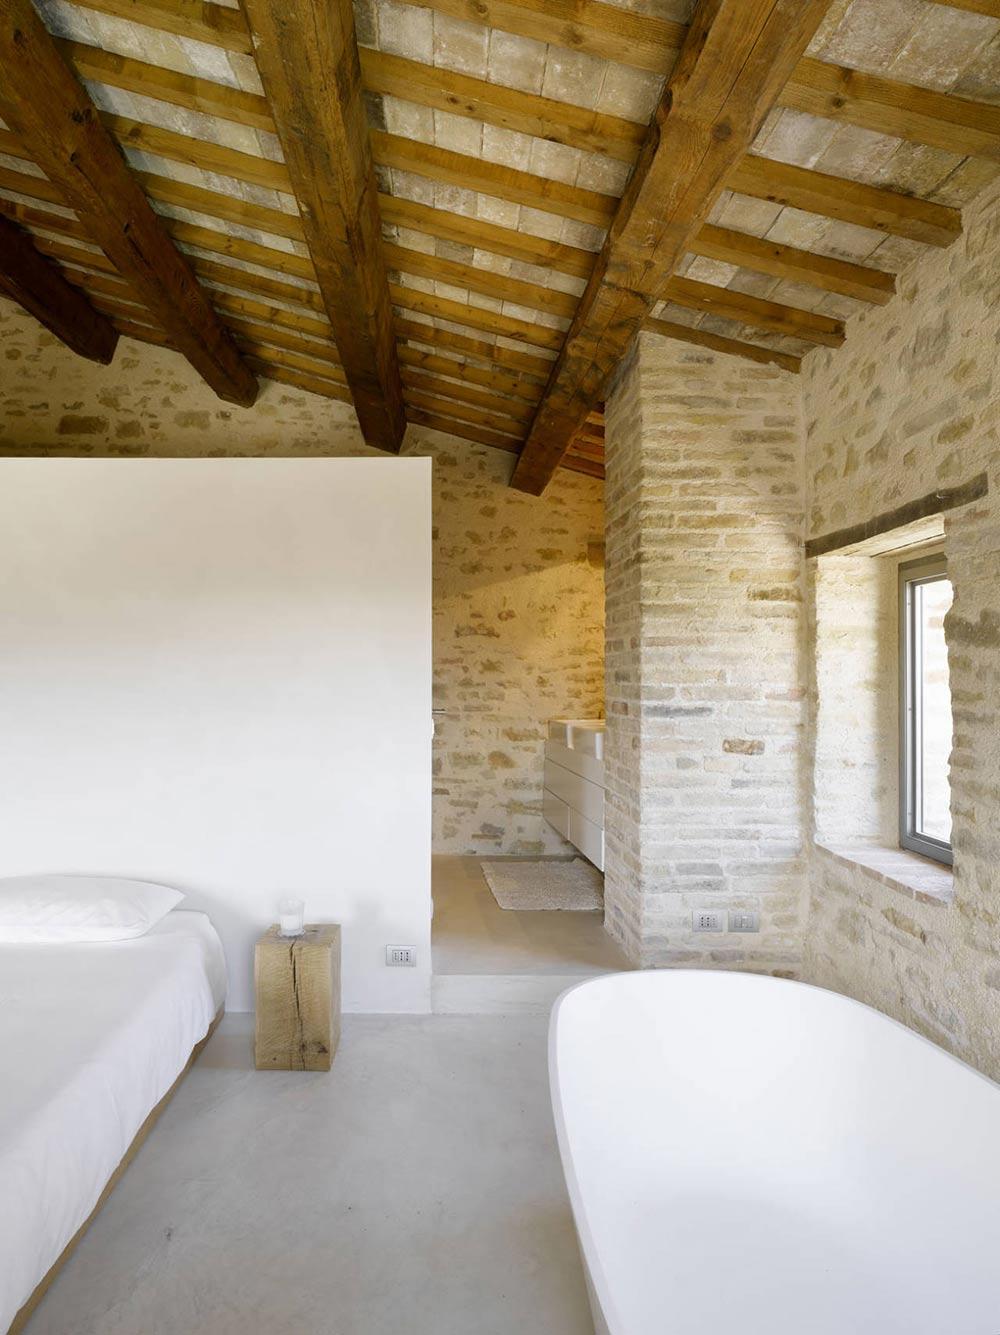 Bedroom, Bathroom, Home Renovation In Treia, Italy by Wespi de Meuron